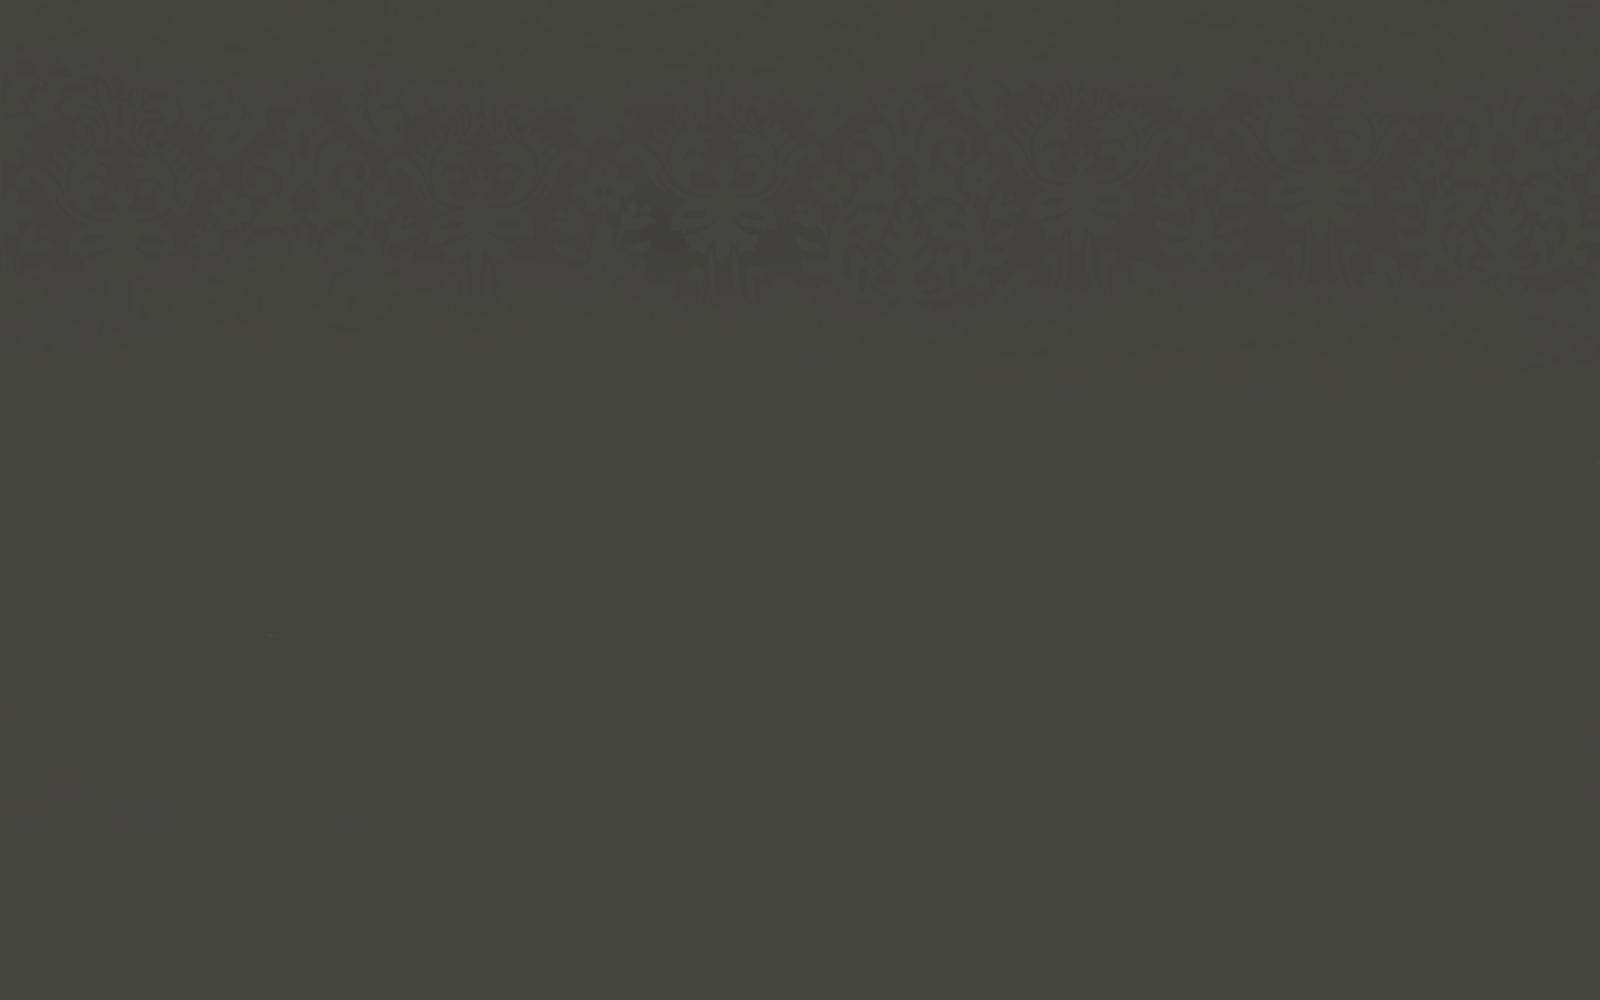 dark grey   Wallpaper 4 Android: wallpaper4android.tk/dark-grey